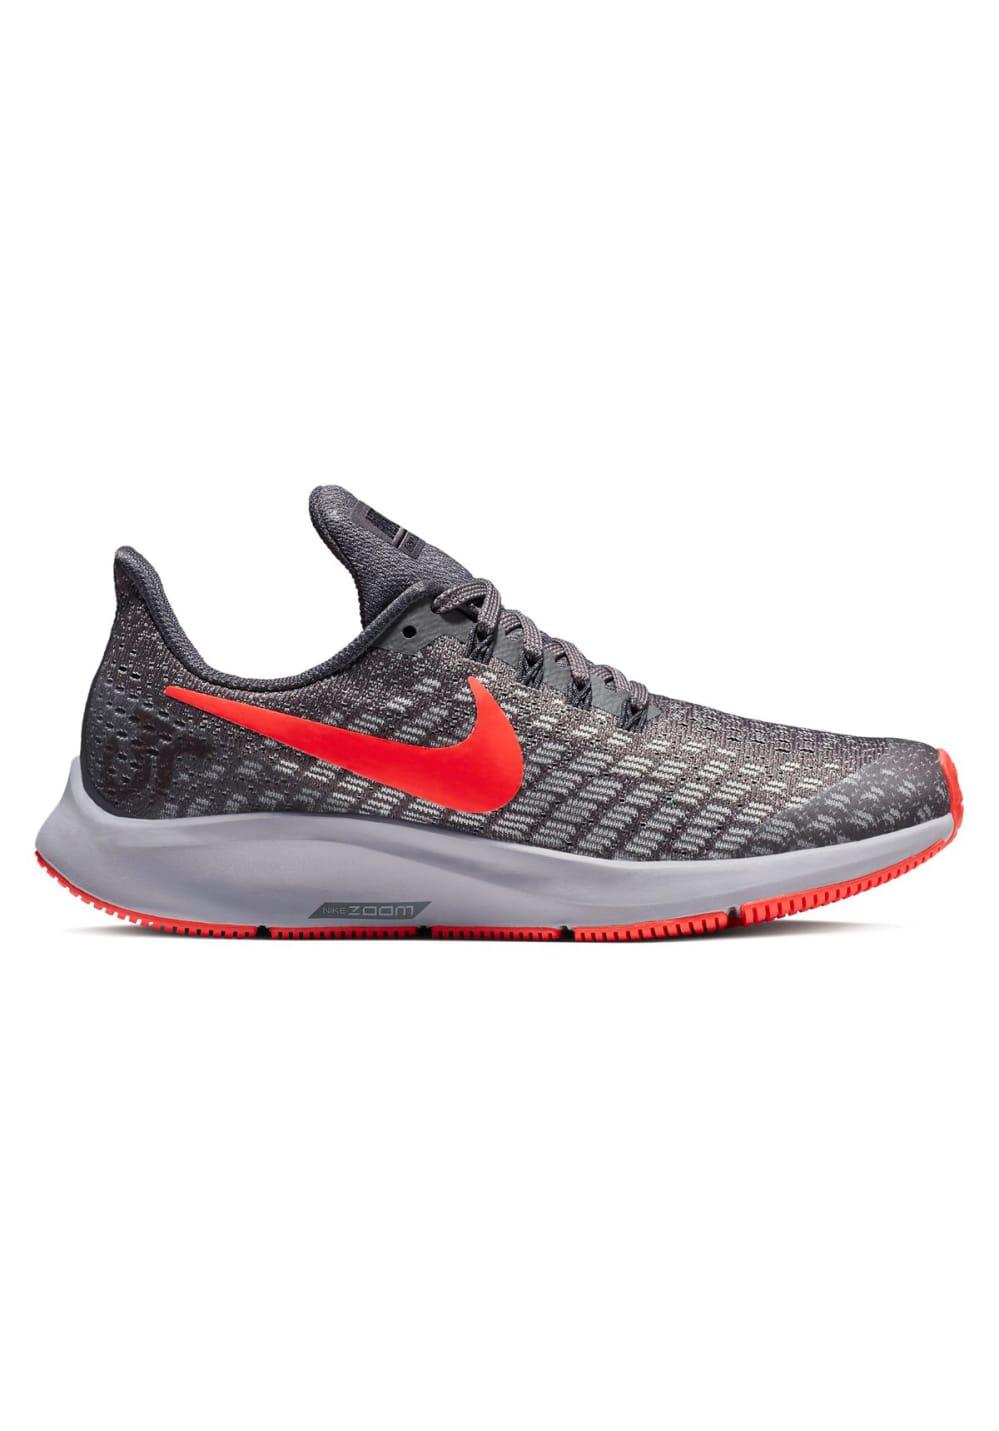 cheap for discount 7db0b 5984d Next. Nike. Air Zoom Pegasus 35 - Chaussures running. 85,66 €.  Prix TTC,  hors frais de port éventuels